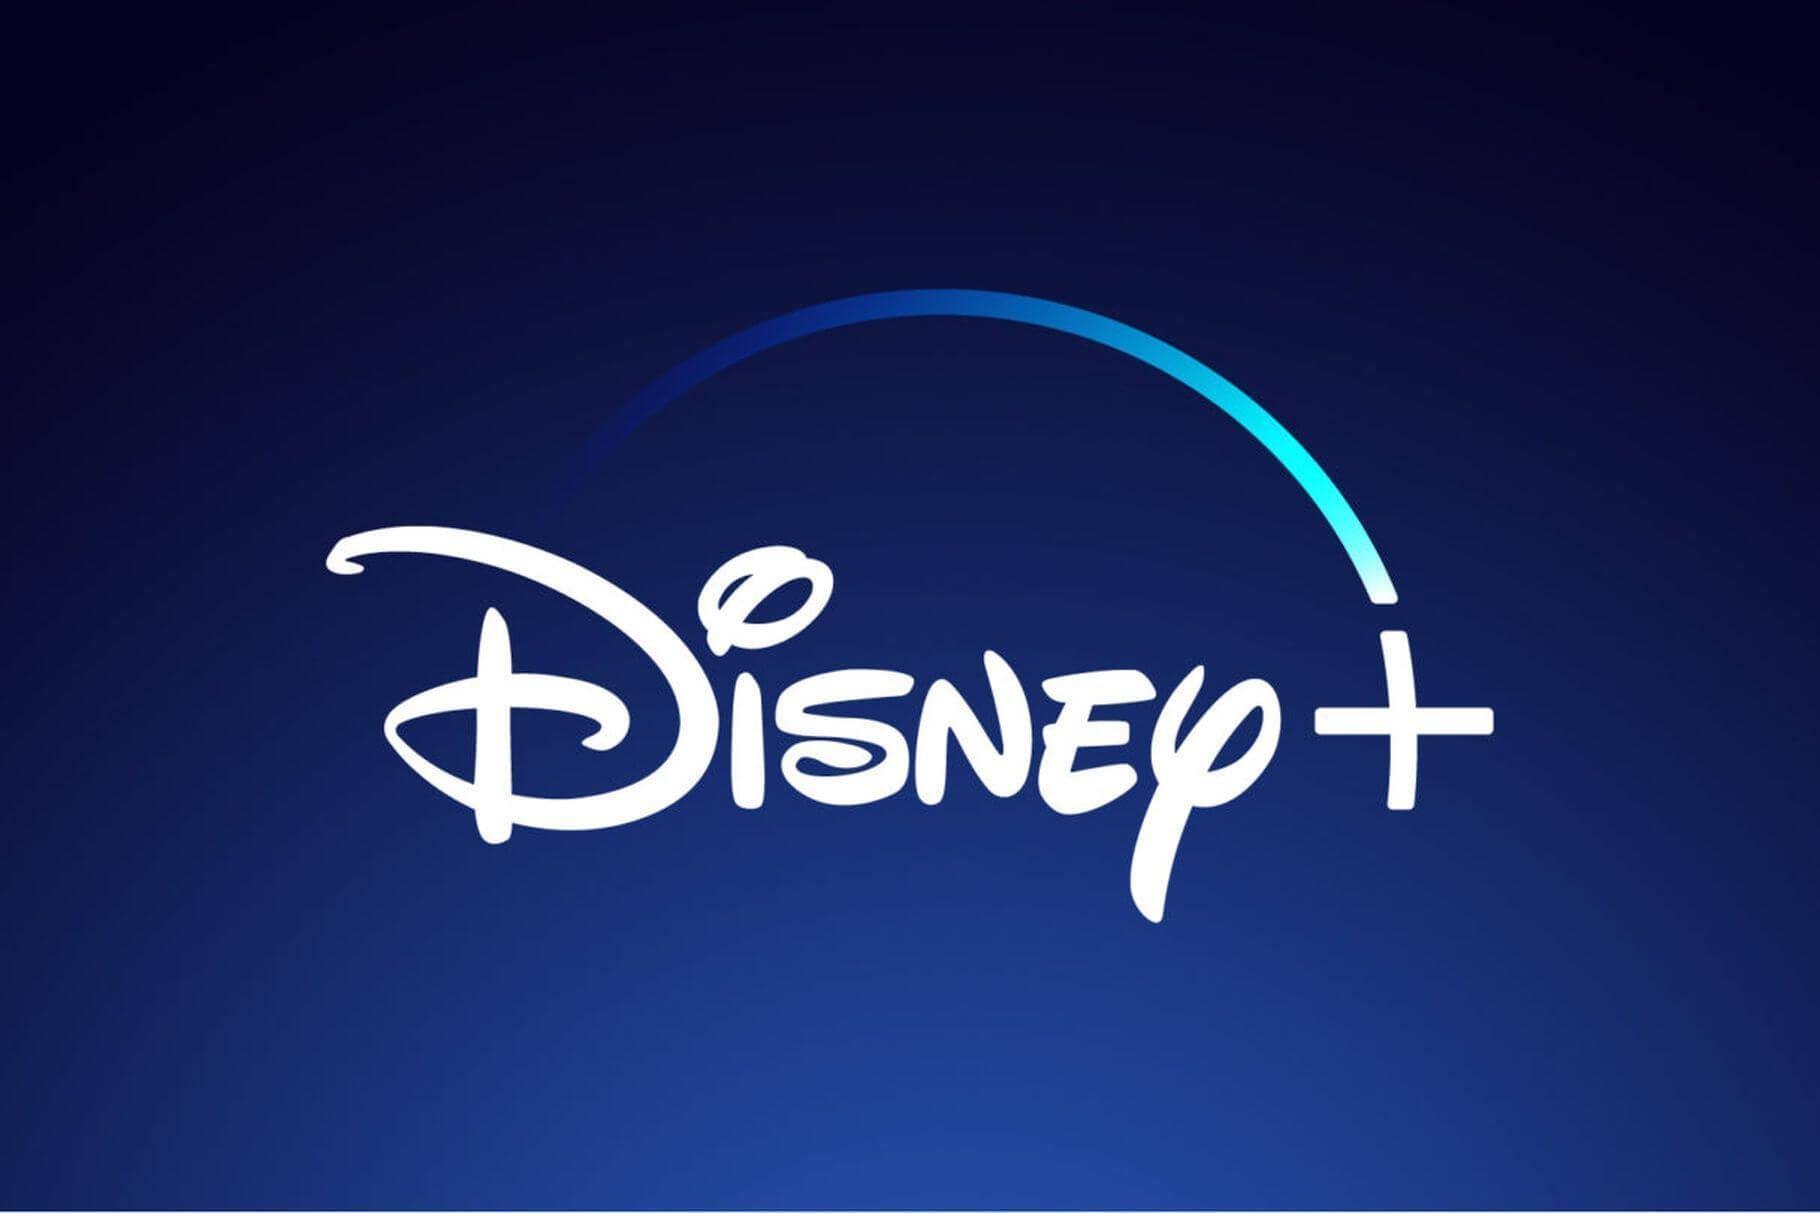 Disney+ streaming 4k